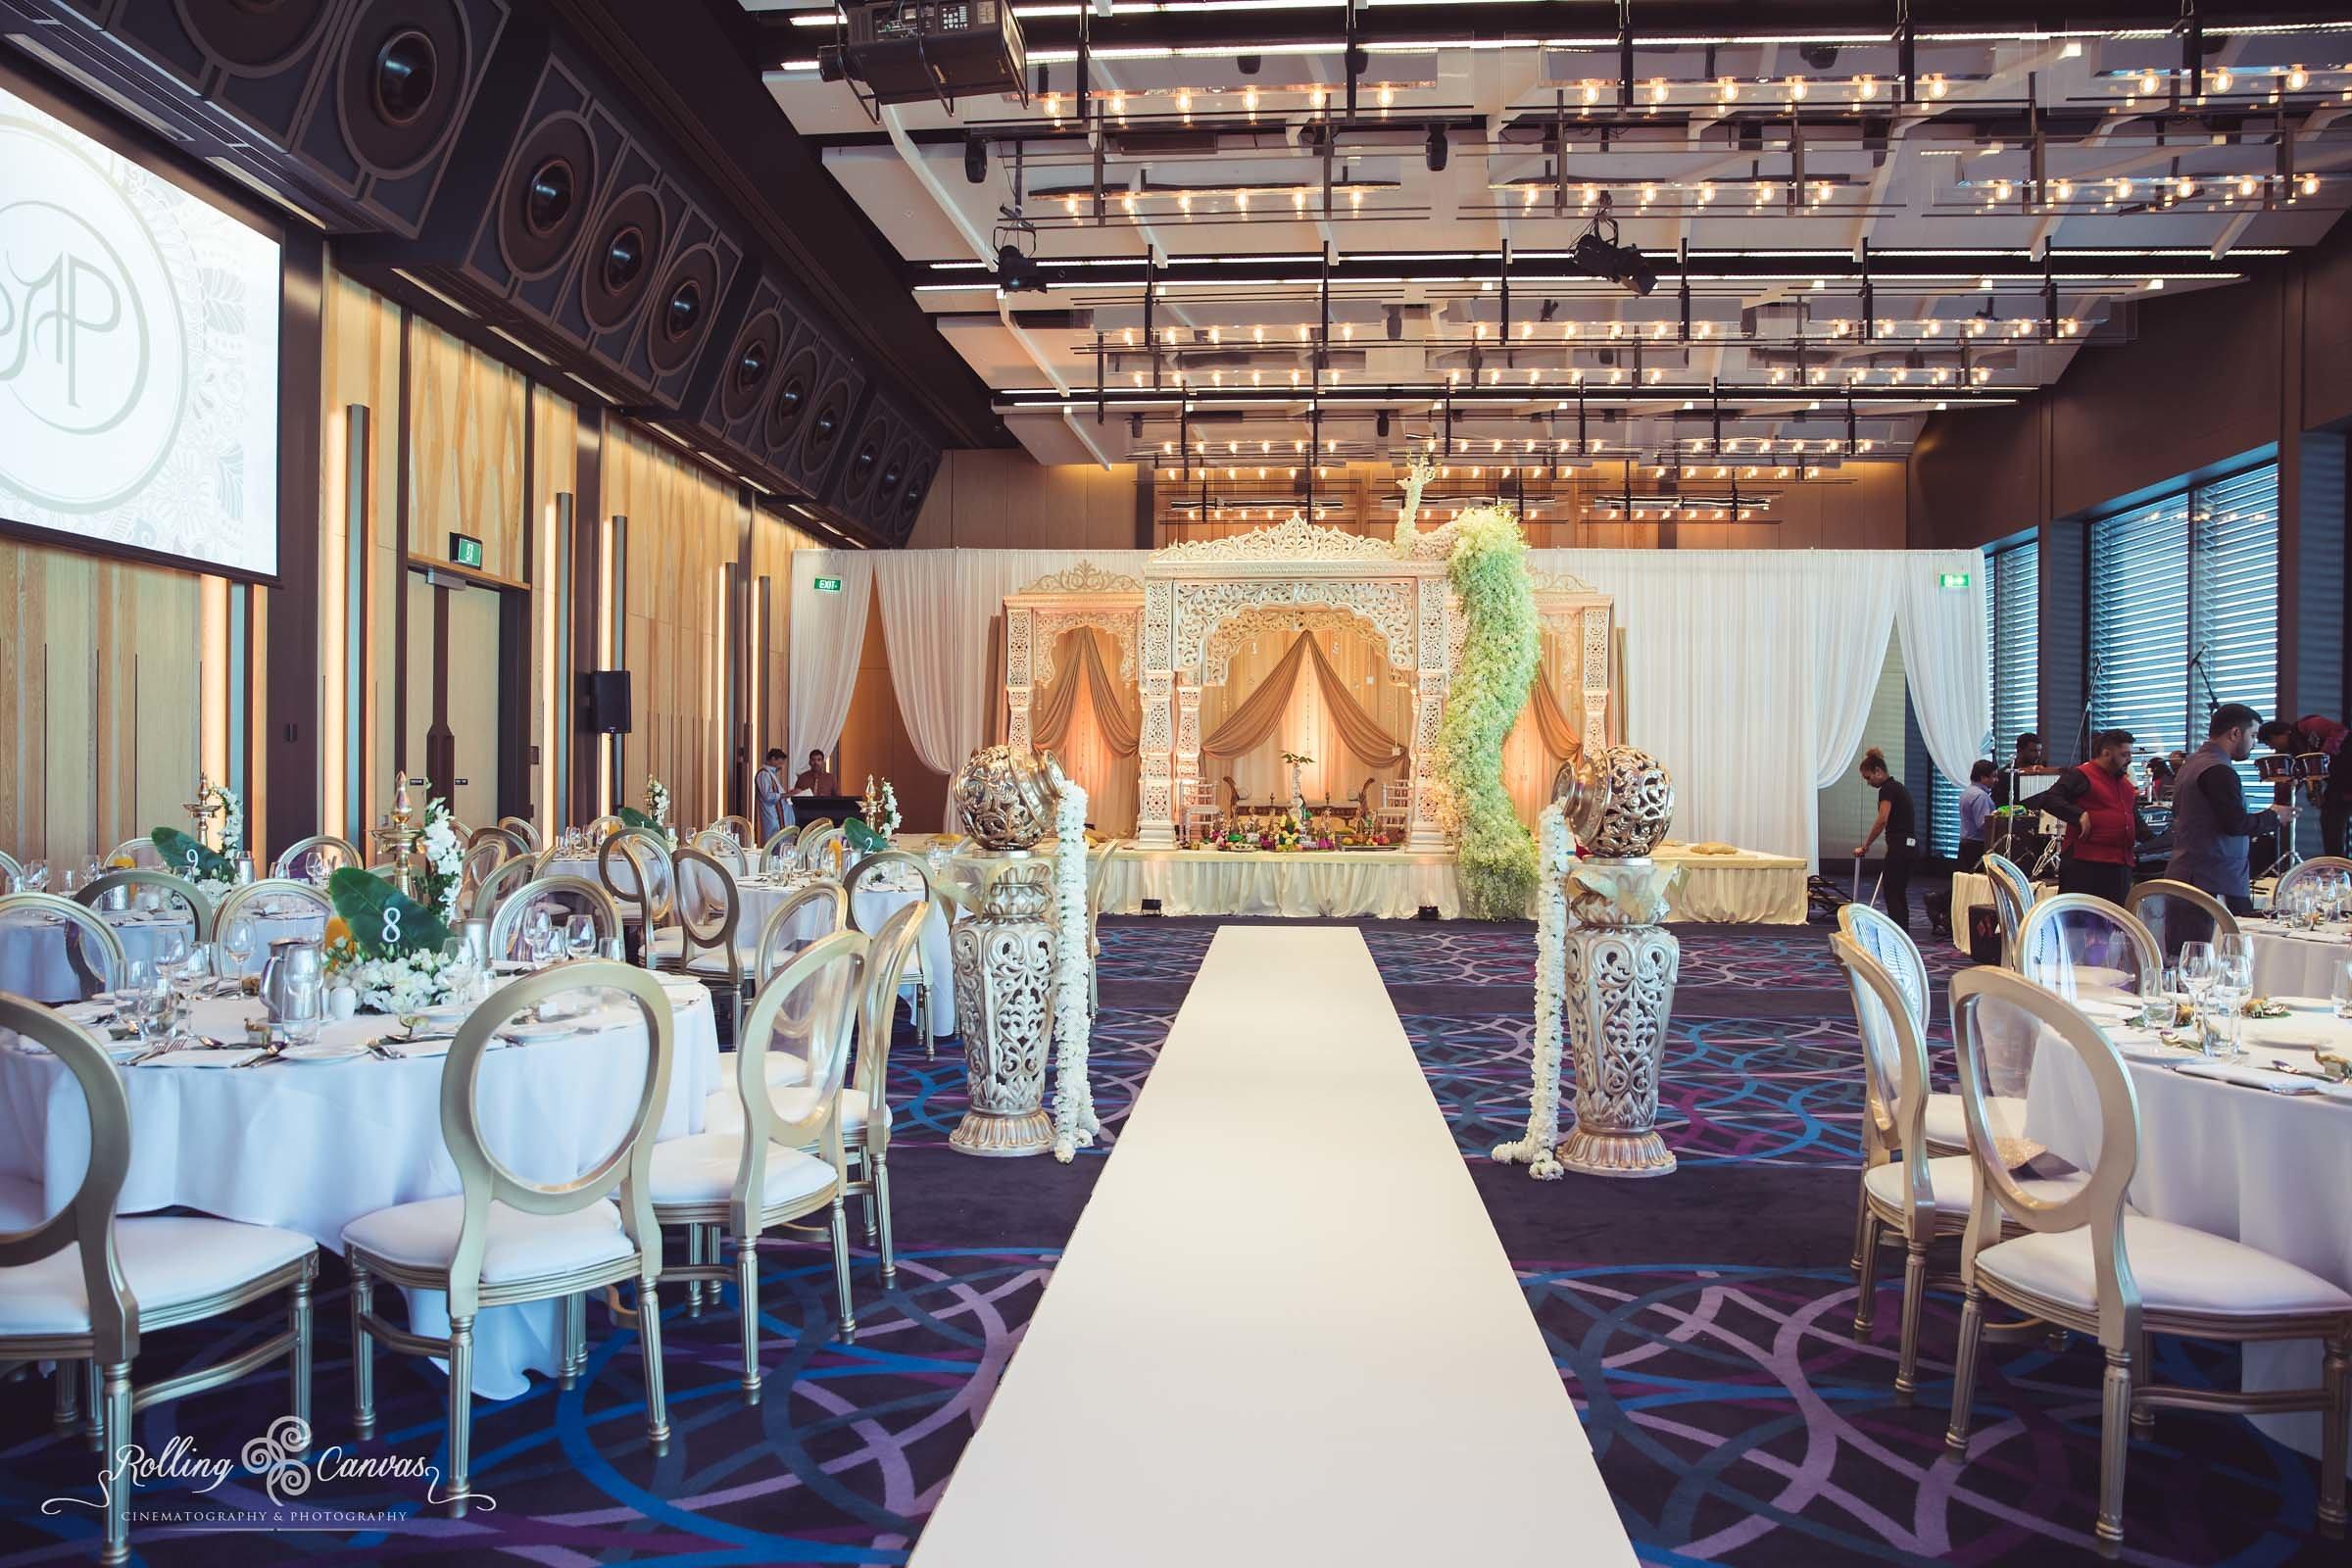 Wedding_Photography_Sydney_Rolling_Canvas_Presentation_Hindu_Ceremony_Mandap_Hyatt_Regency_Floral_Design-57068.jpg